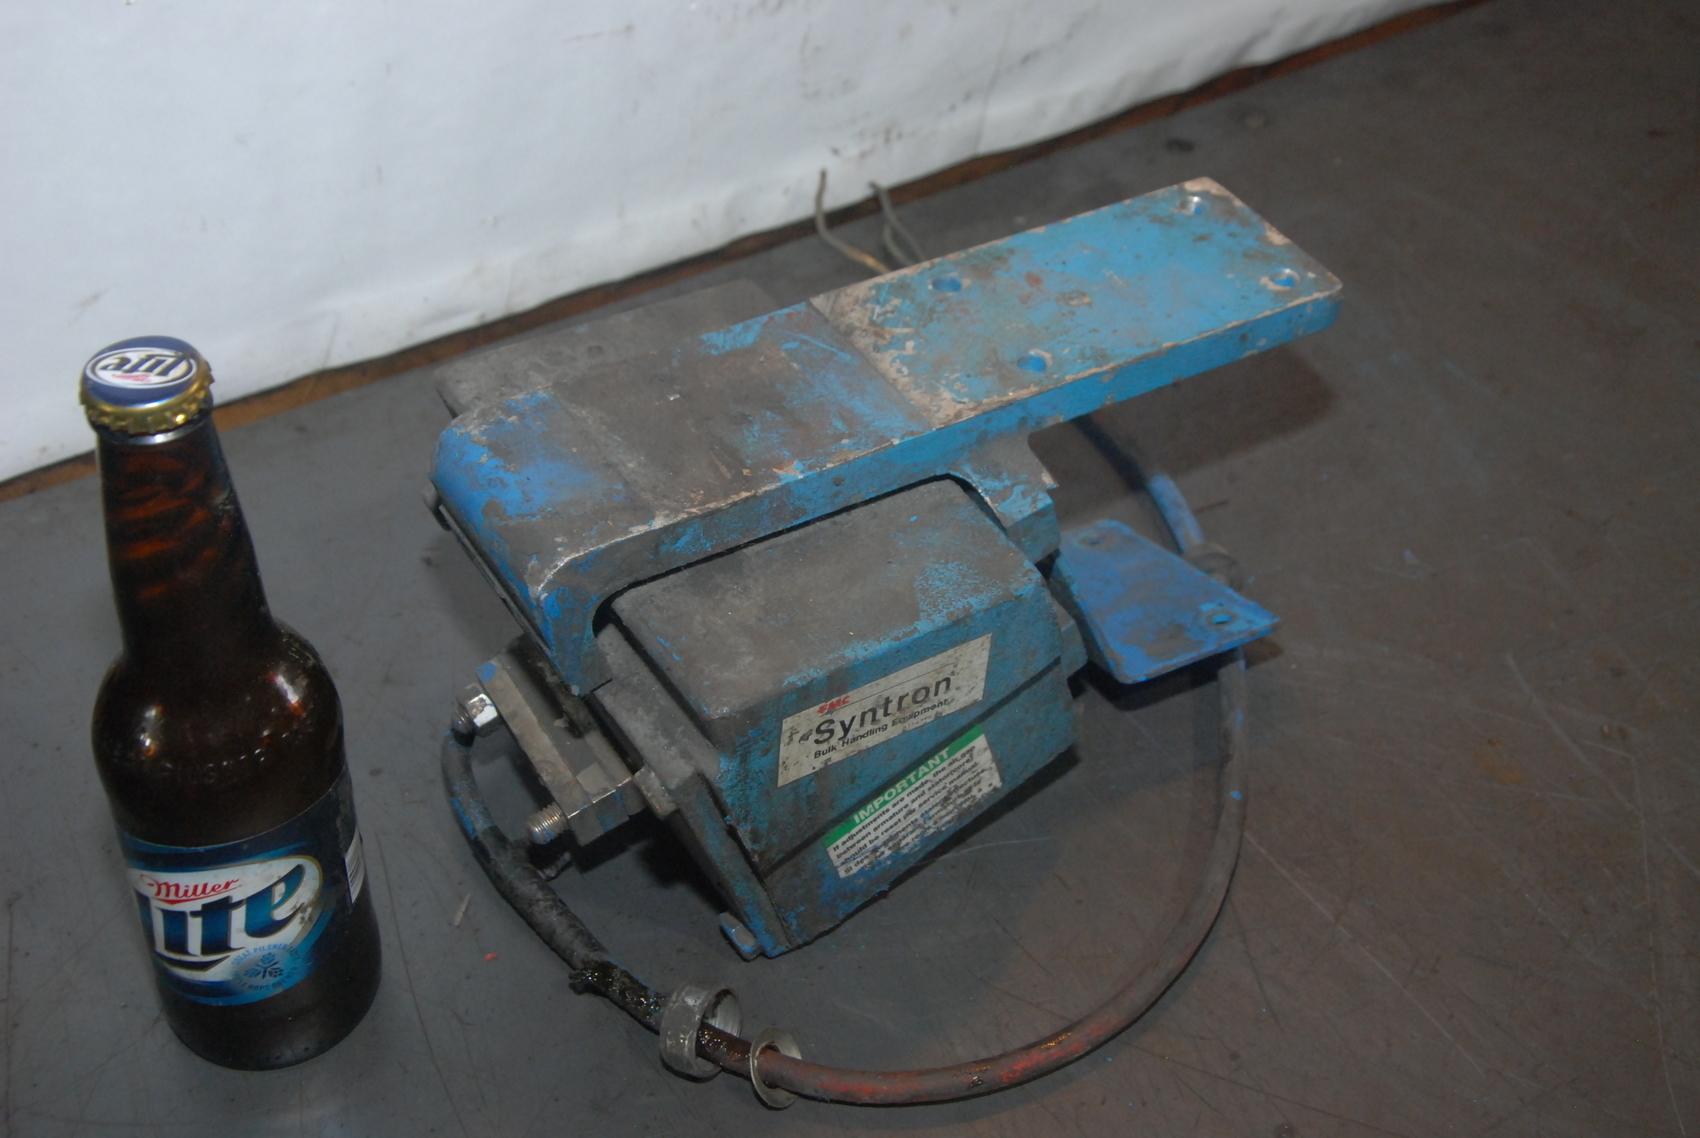 Syntron vibrator magnetic feeder model BF-01C